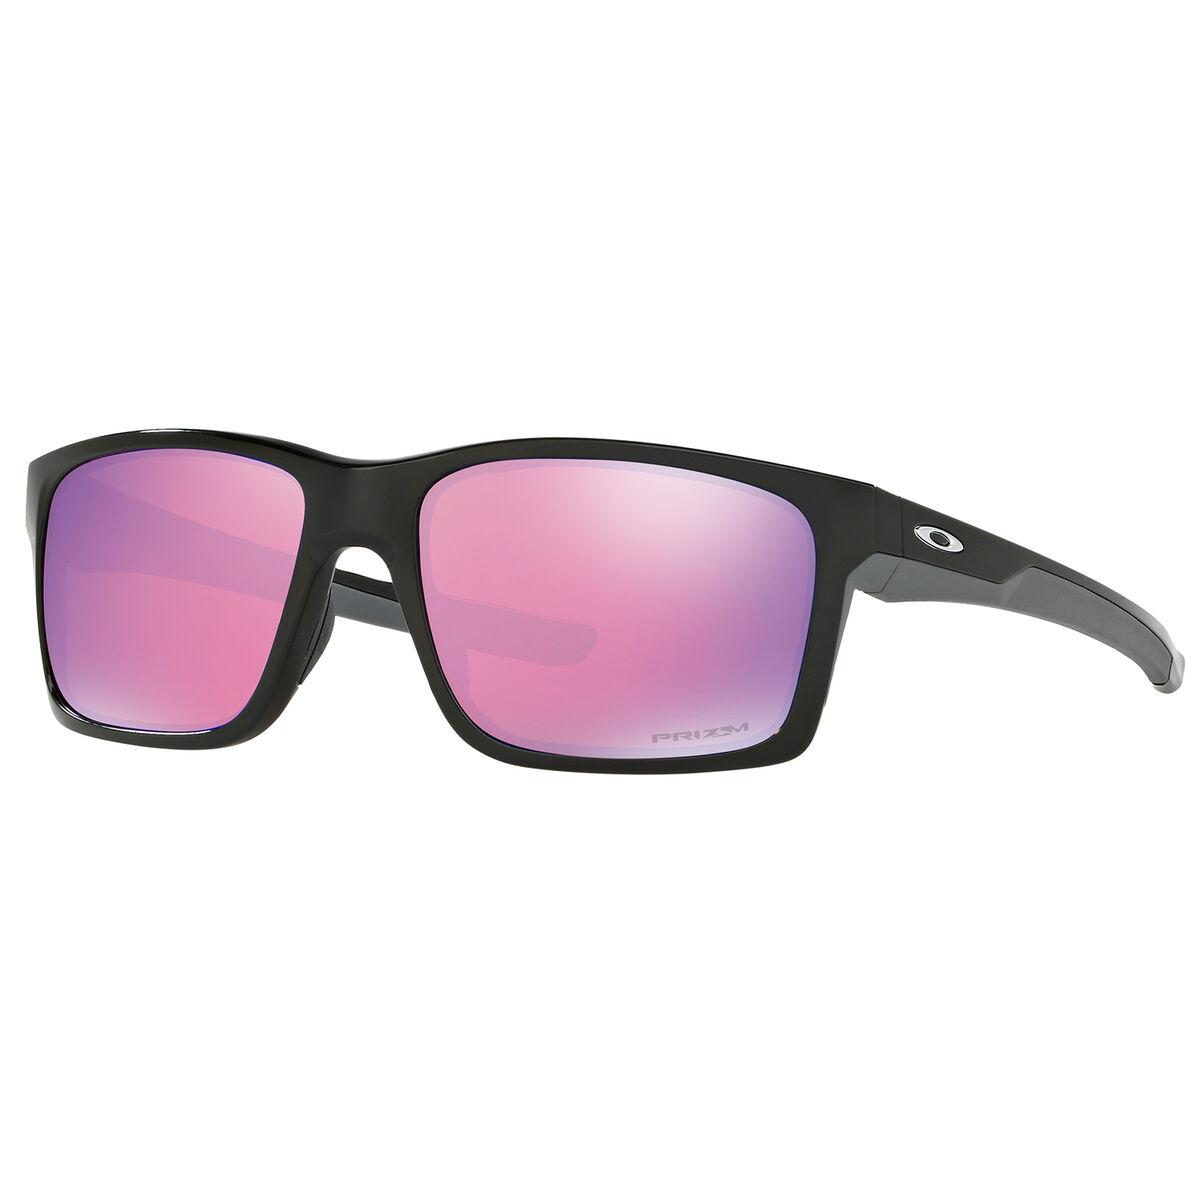 929f873a42 Images. Oakley Mainlink Prizm Sunglasses